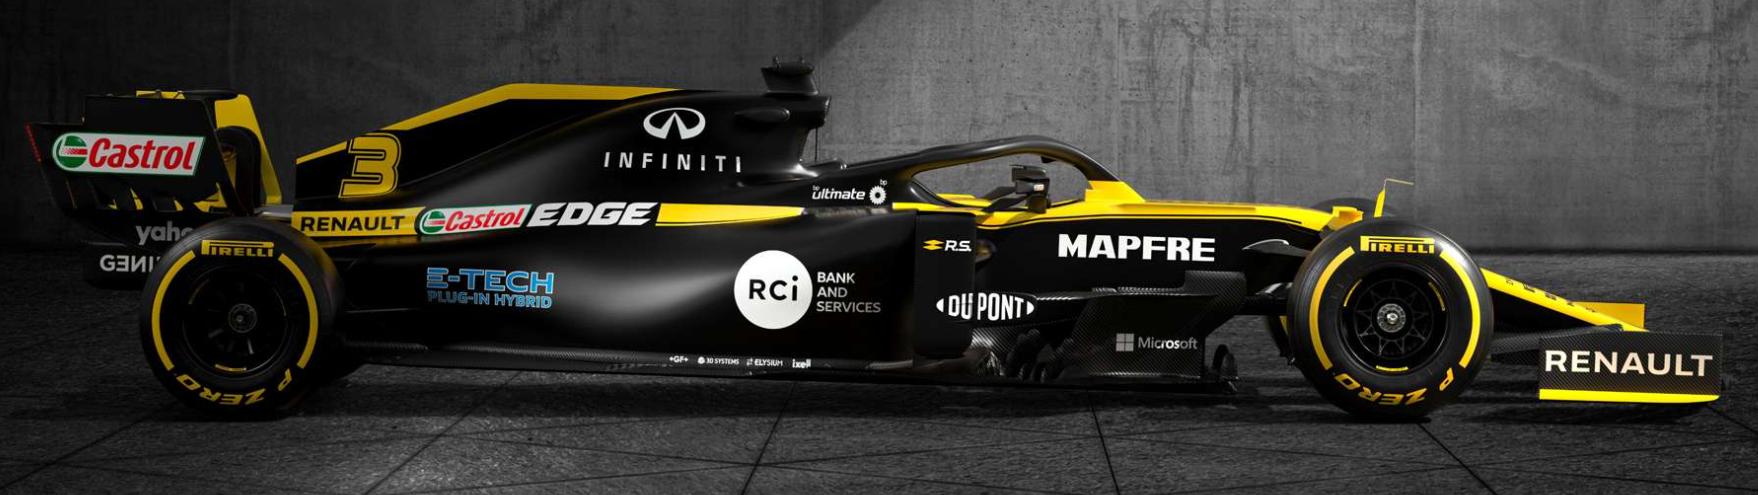 Renault RS20 F1 car - 2020 season